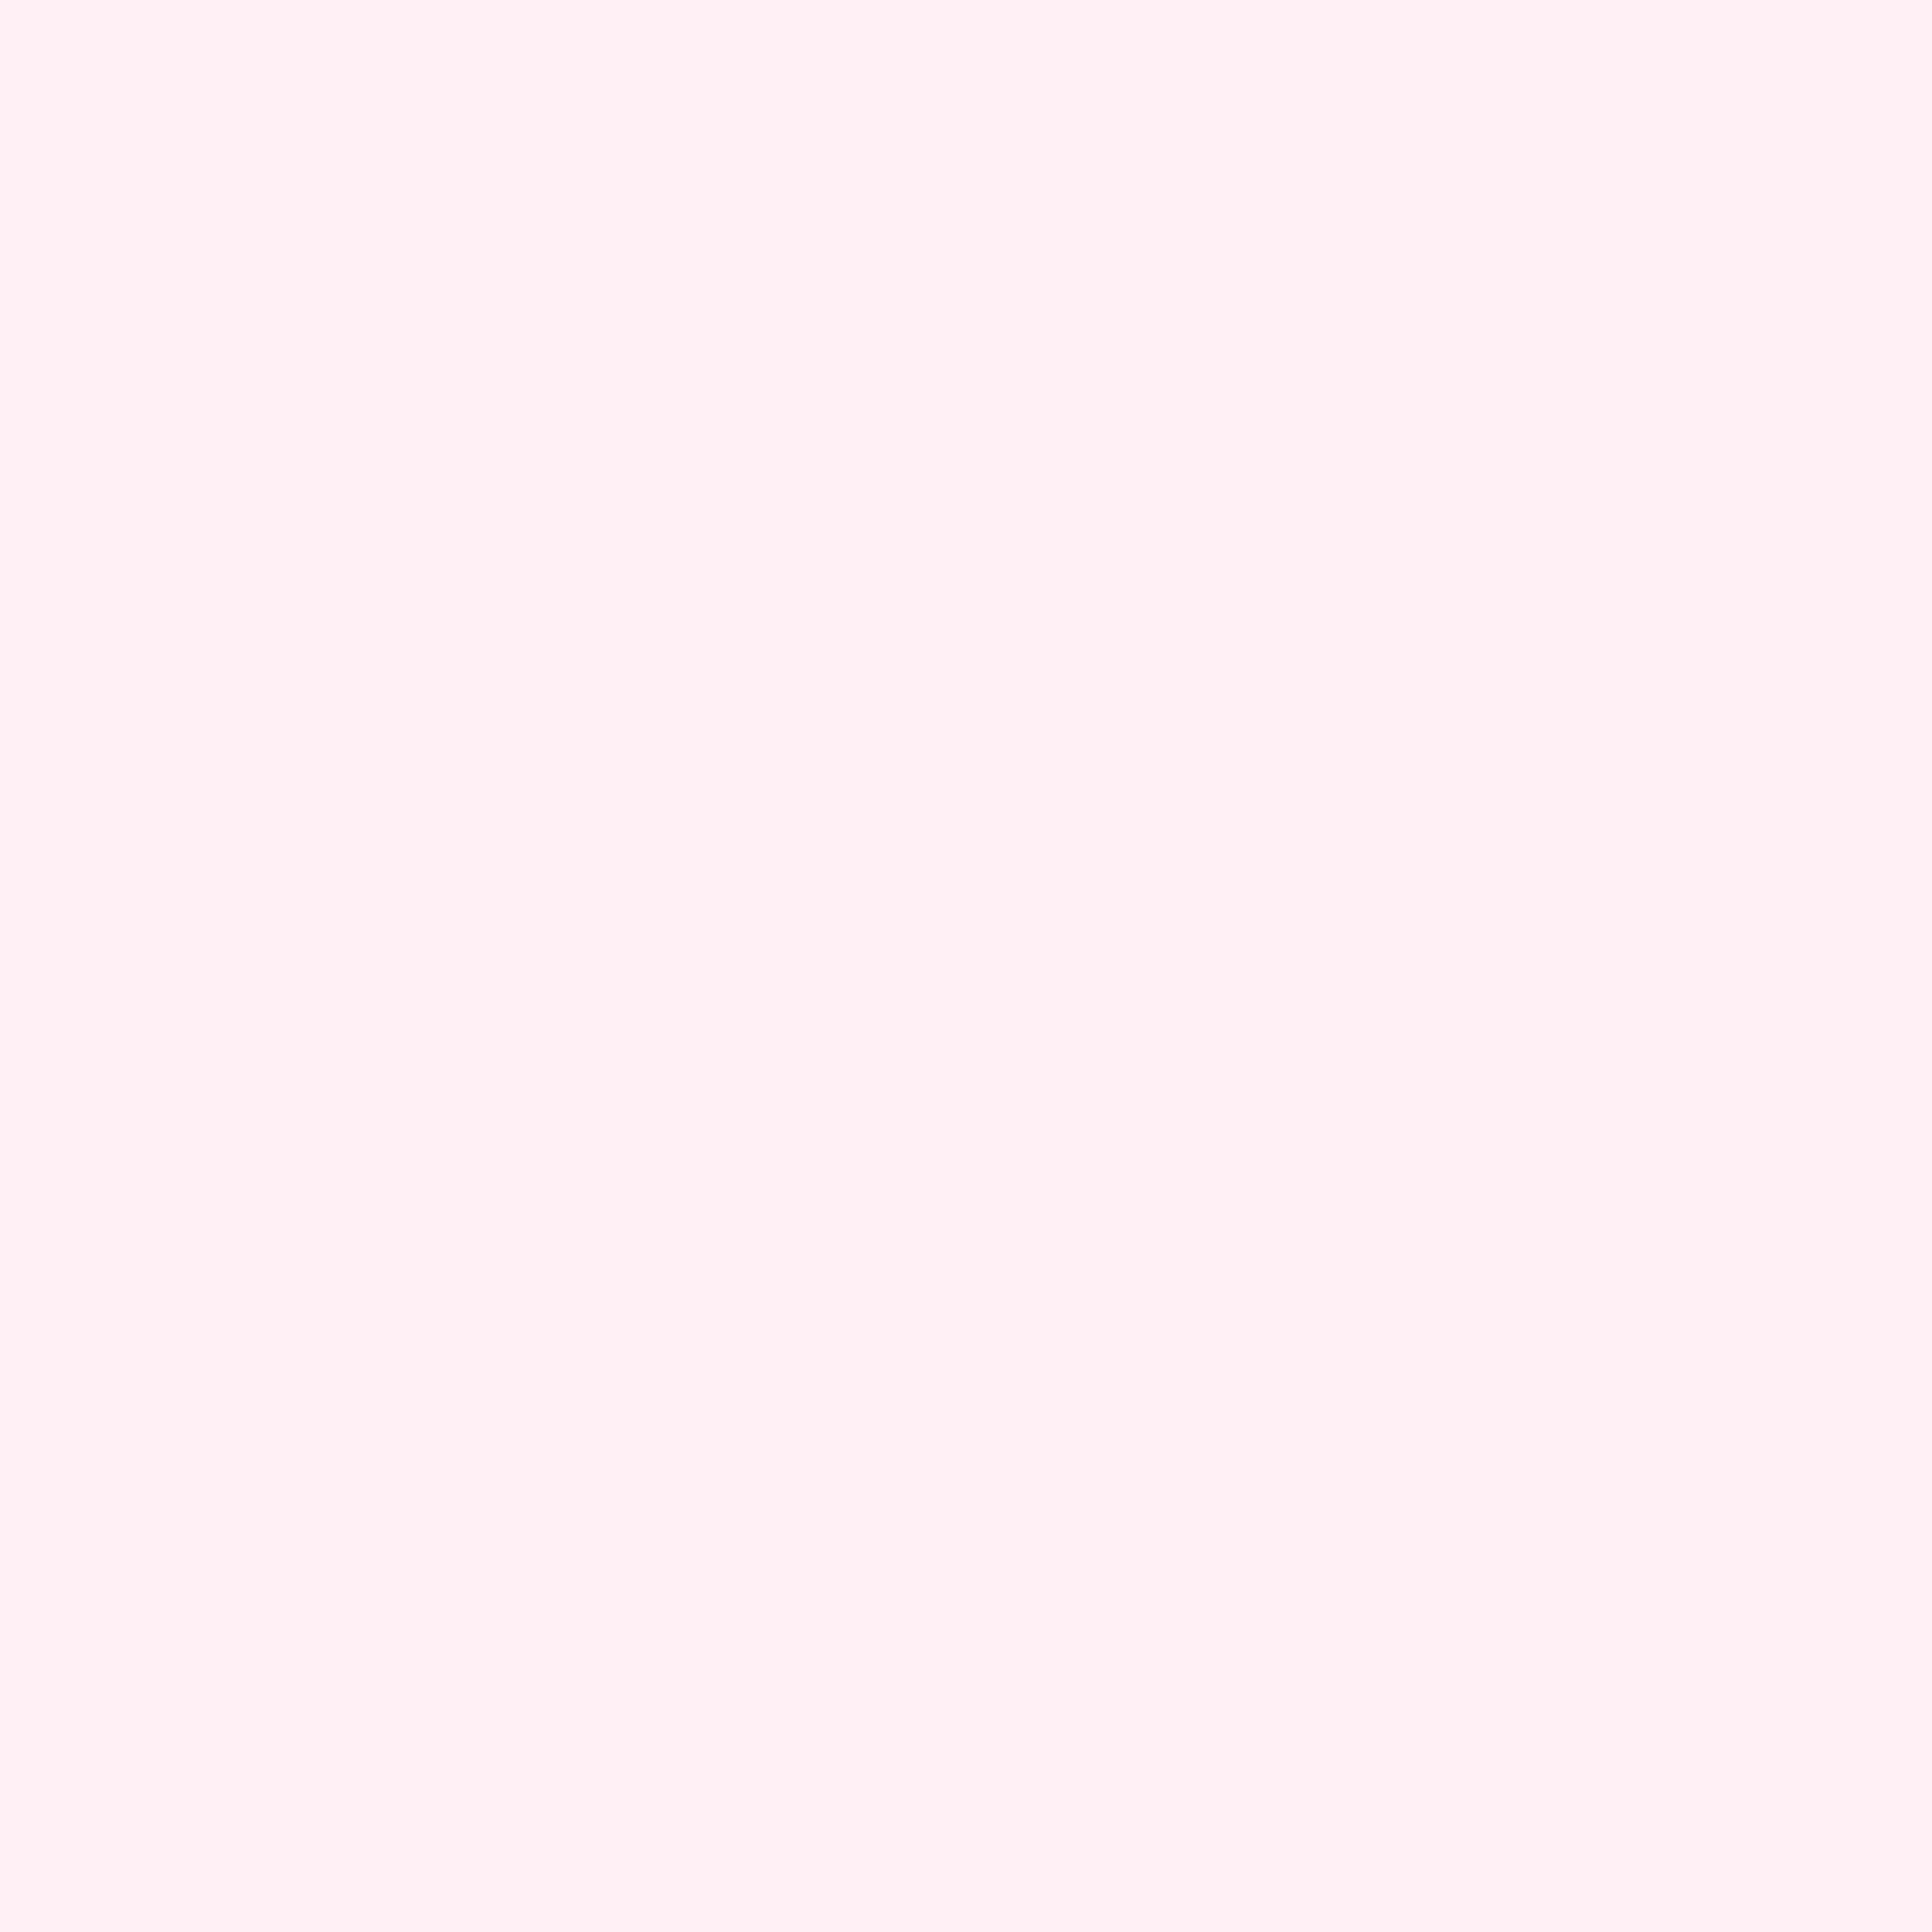 3600x3600 Lavender Blush Solid Color Background